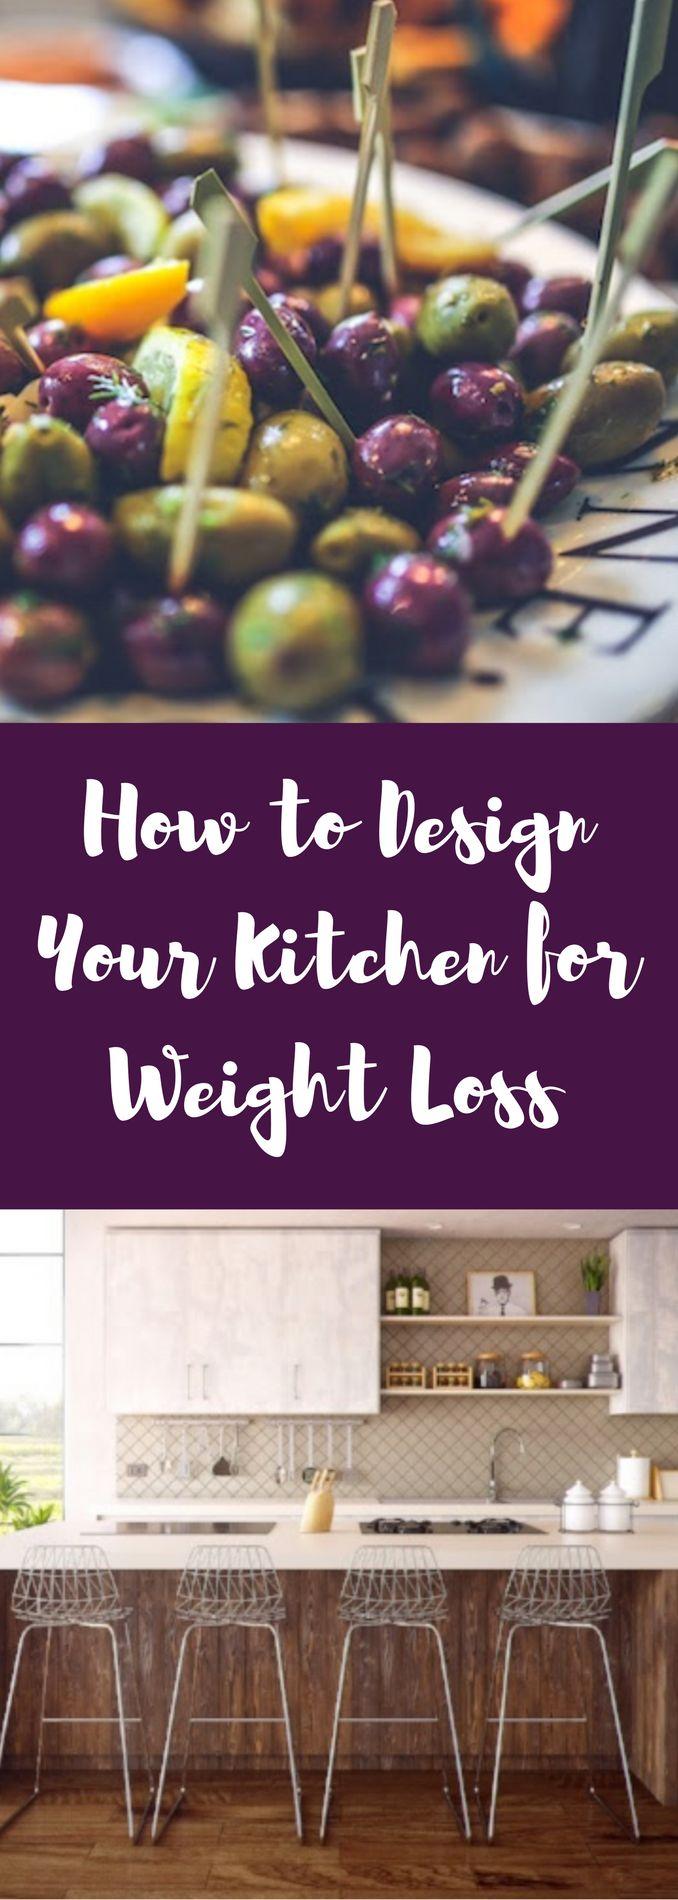 Kitchen layout ideas for weight loss! #weightloss #kitchen #kitchendesign